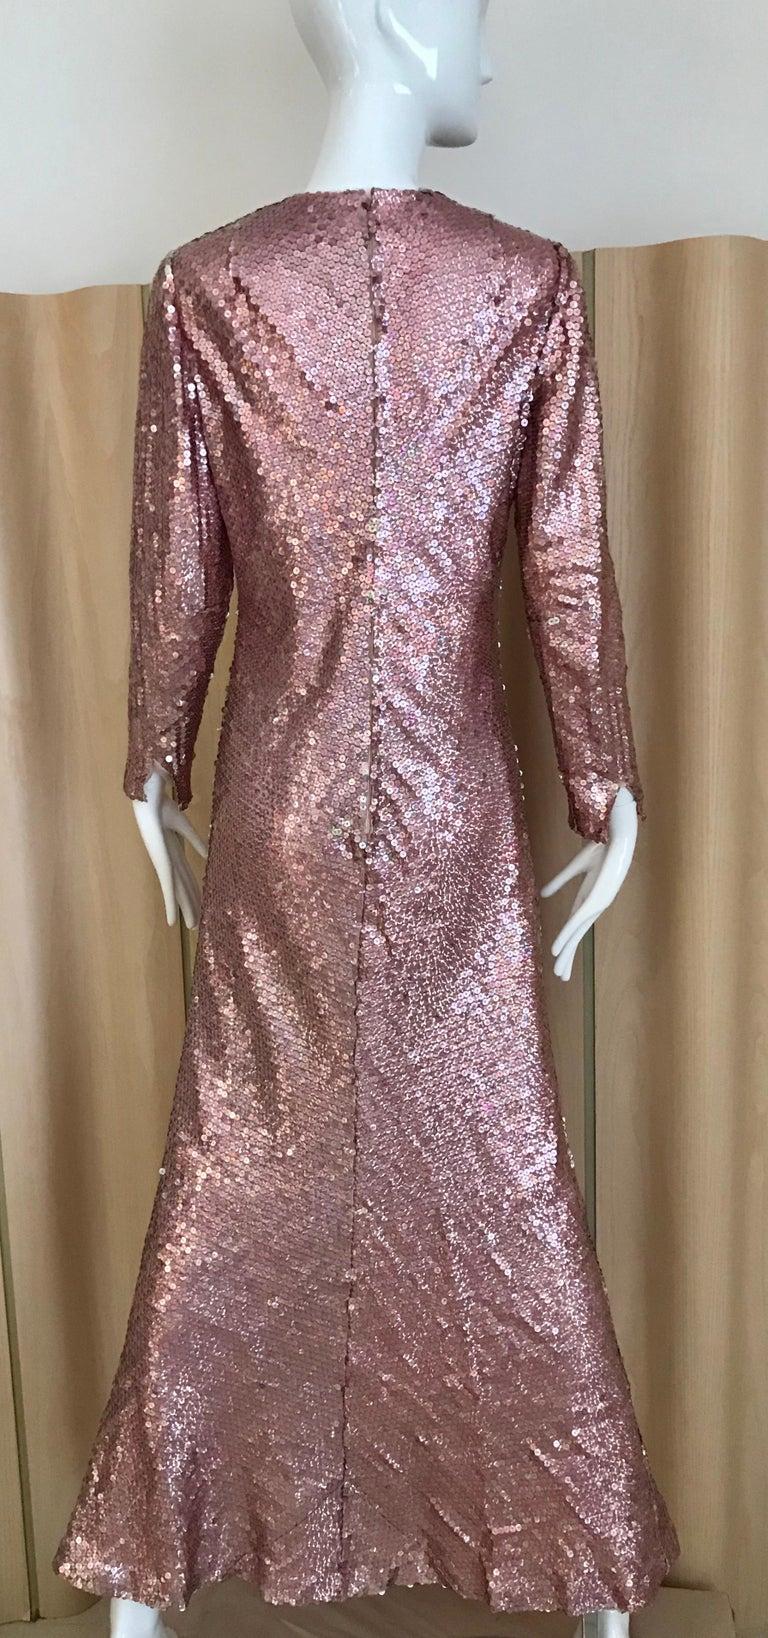 Brown 1970s Bill Blass Pink Metallic Sequin Long Sleeve Gown For Sale